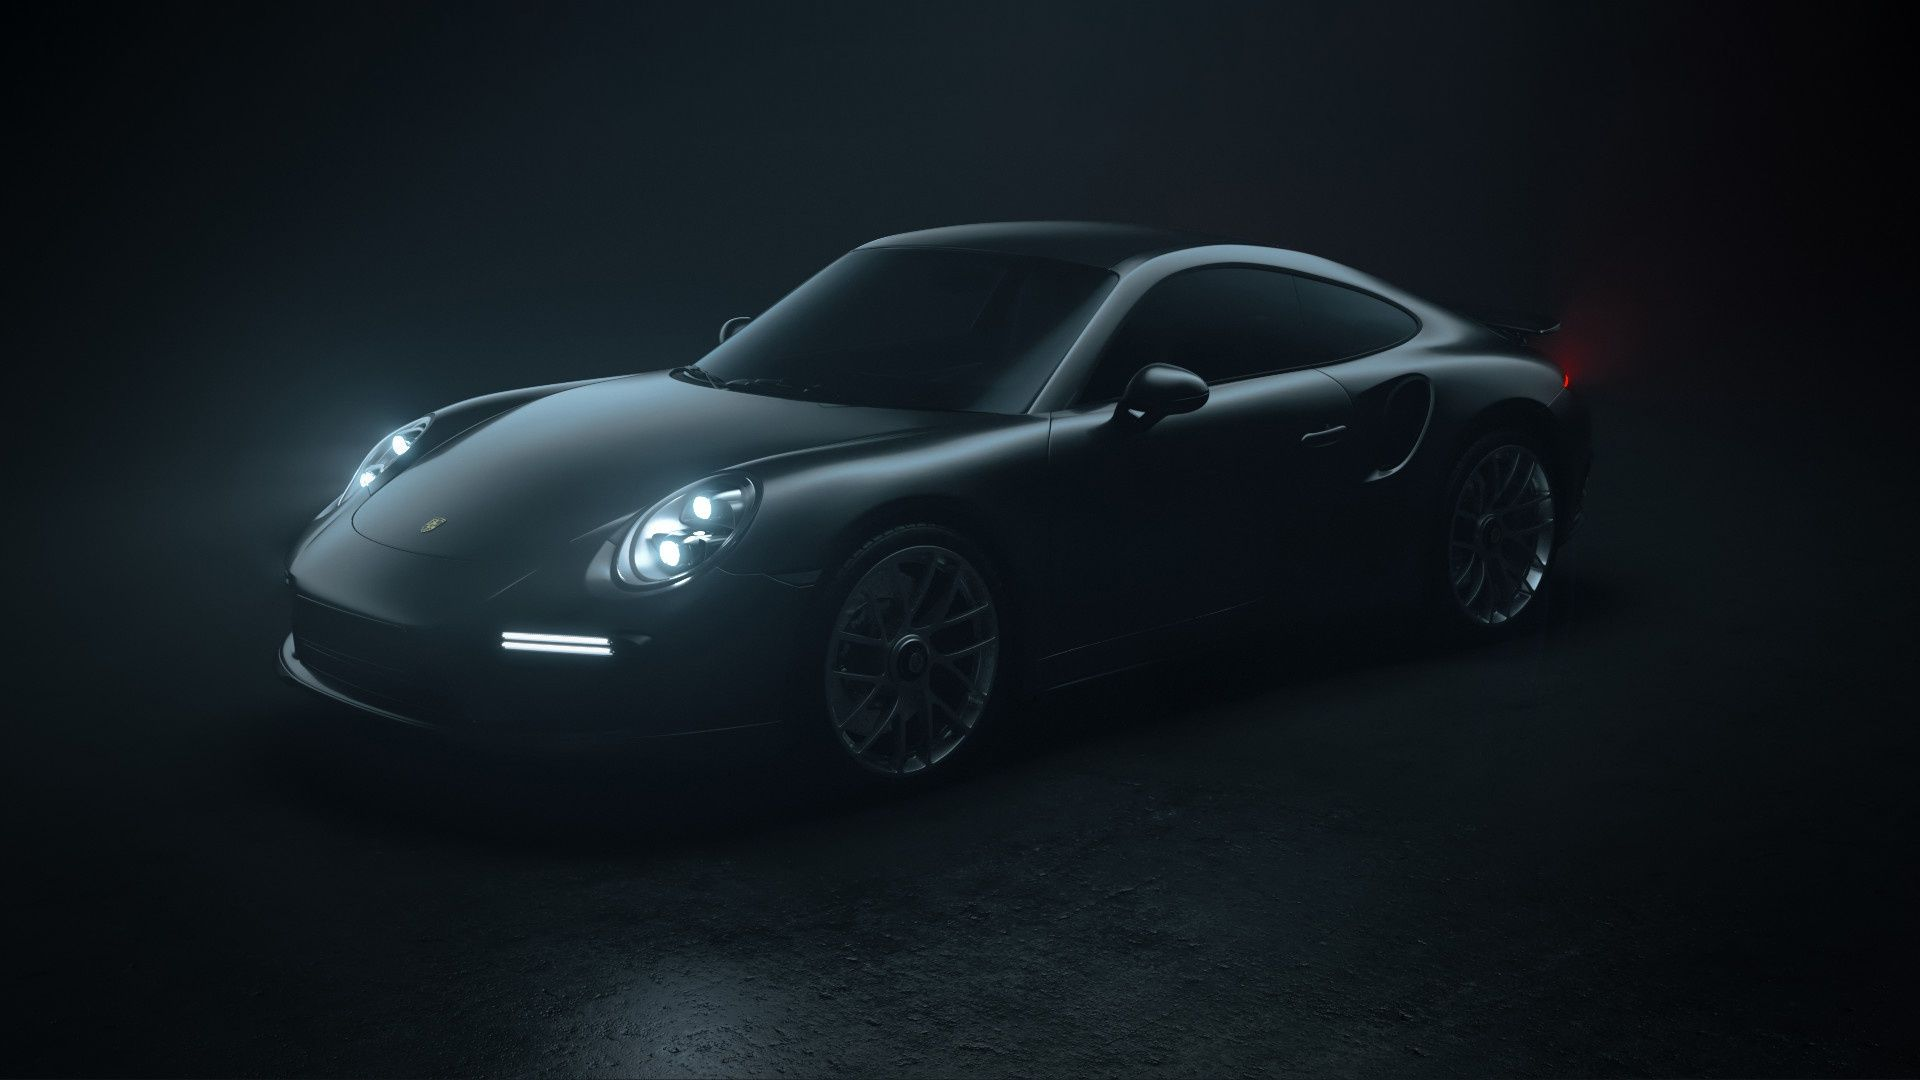 Porsche Black Wallpapers Wallpaper Cave